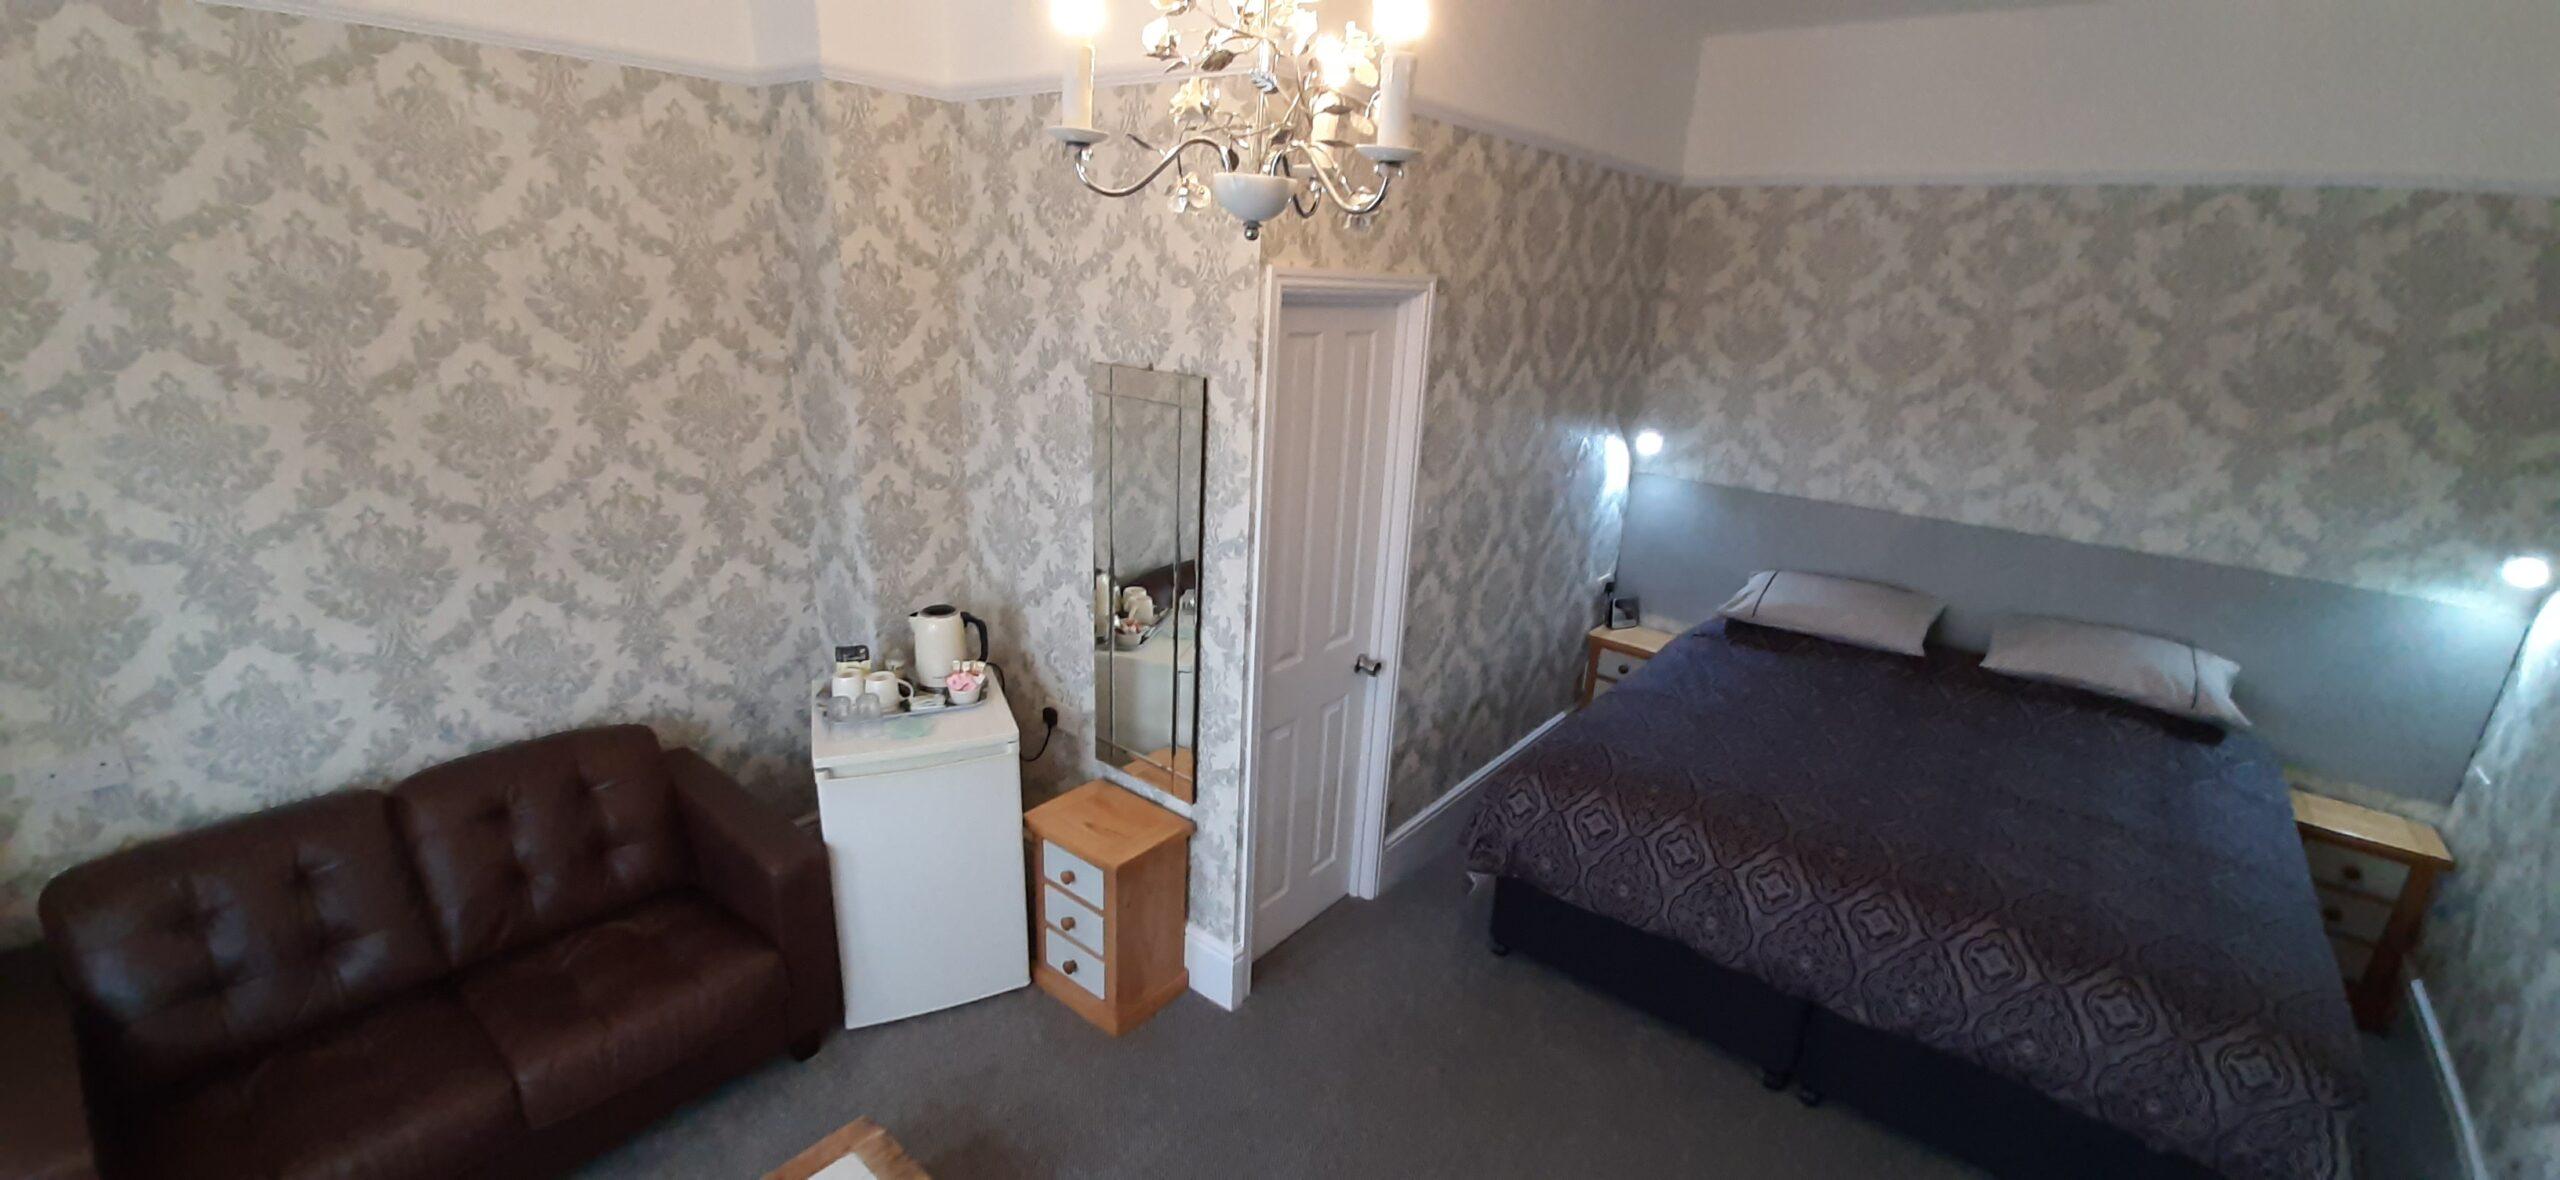 Room 1 Large Super King / Twin En-suite with Sofa & Fridge